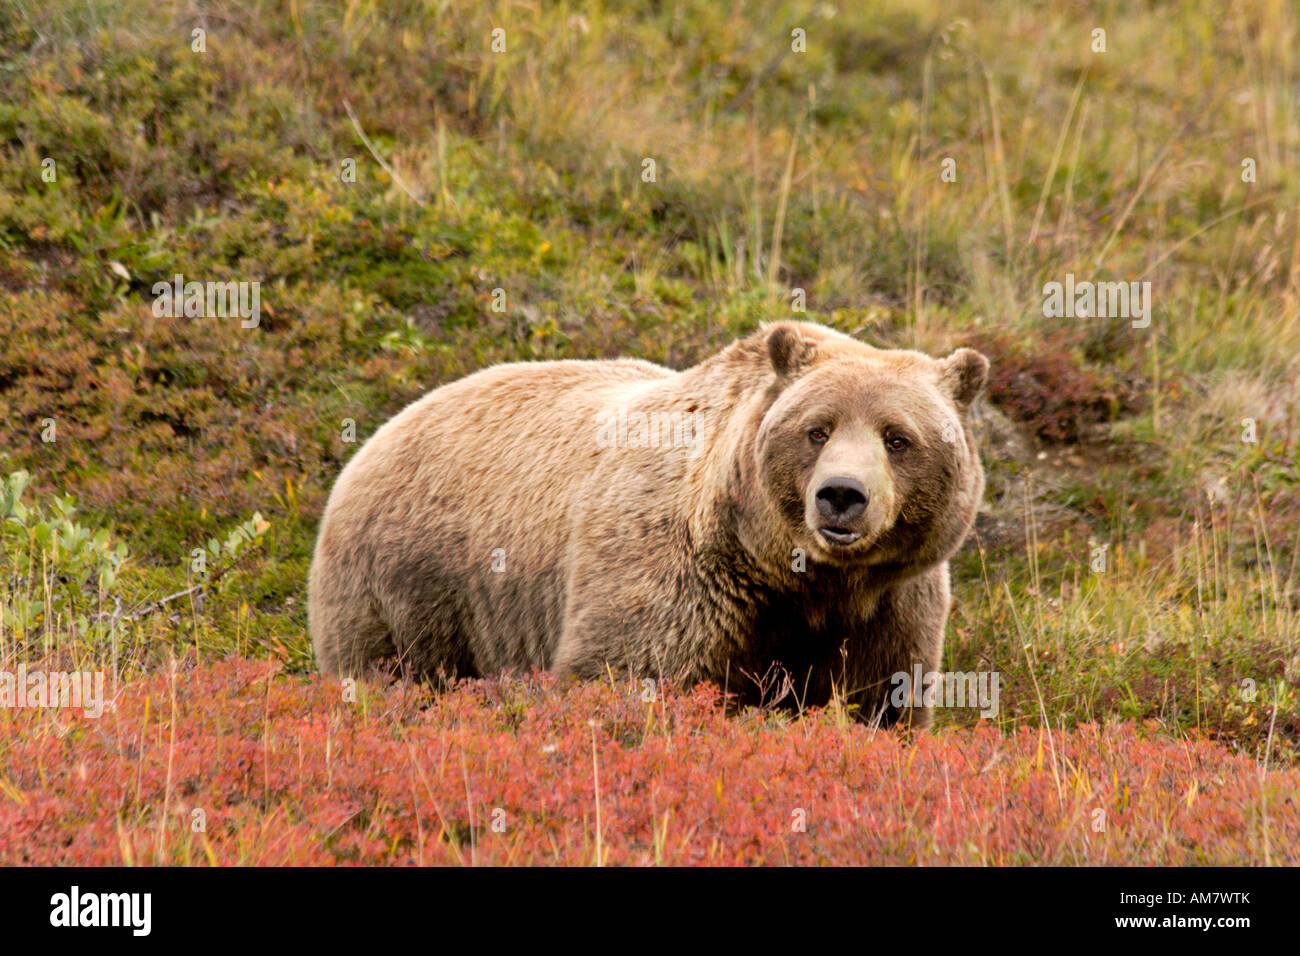 Grizzly Bären, Ursus Arctos Horribilis, Männlich, Alaska, USA Stockbild